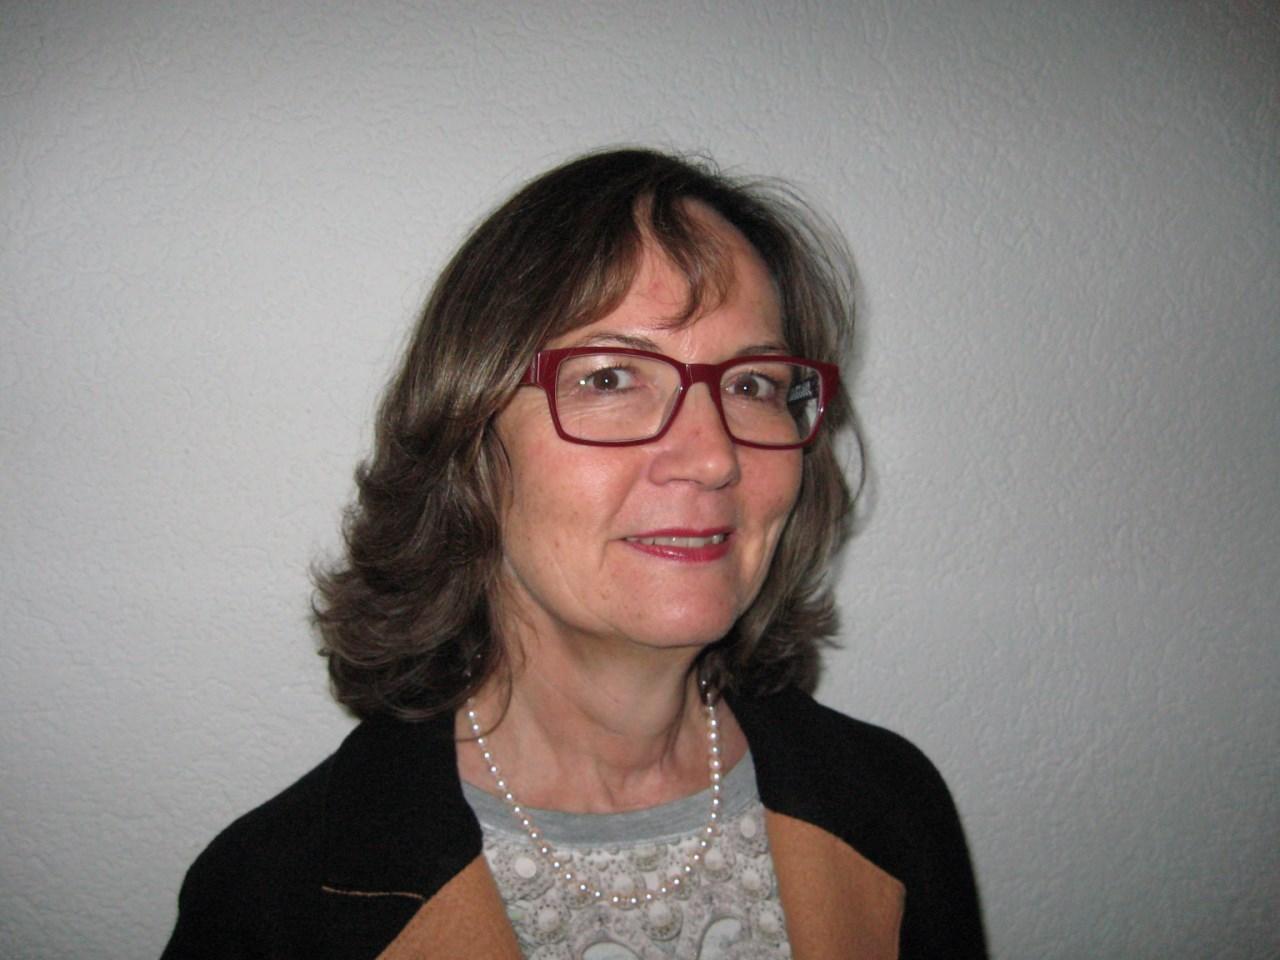 Richterin, Direktorin am Amtsgericht Lindau